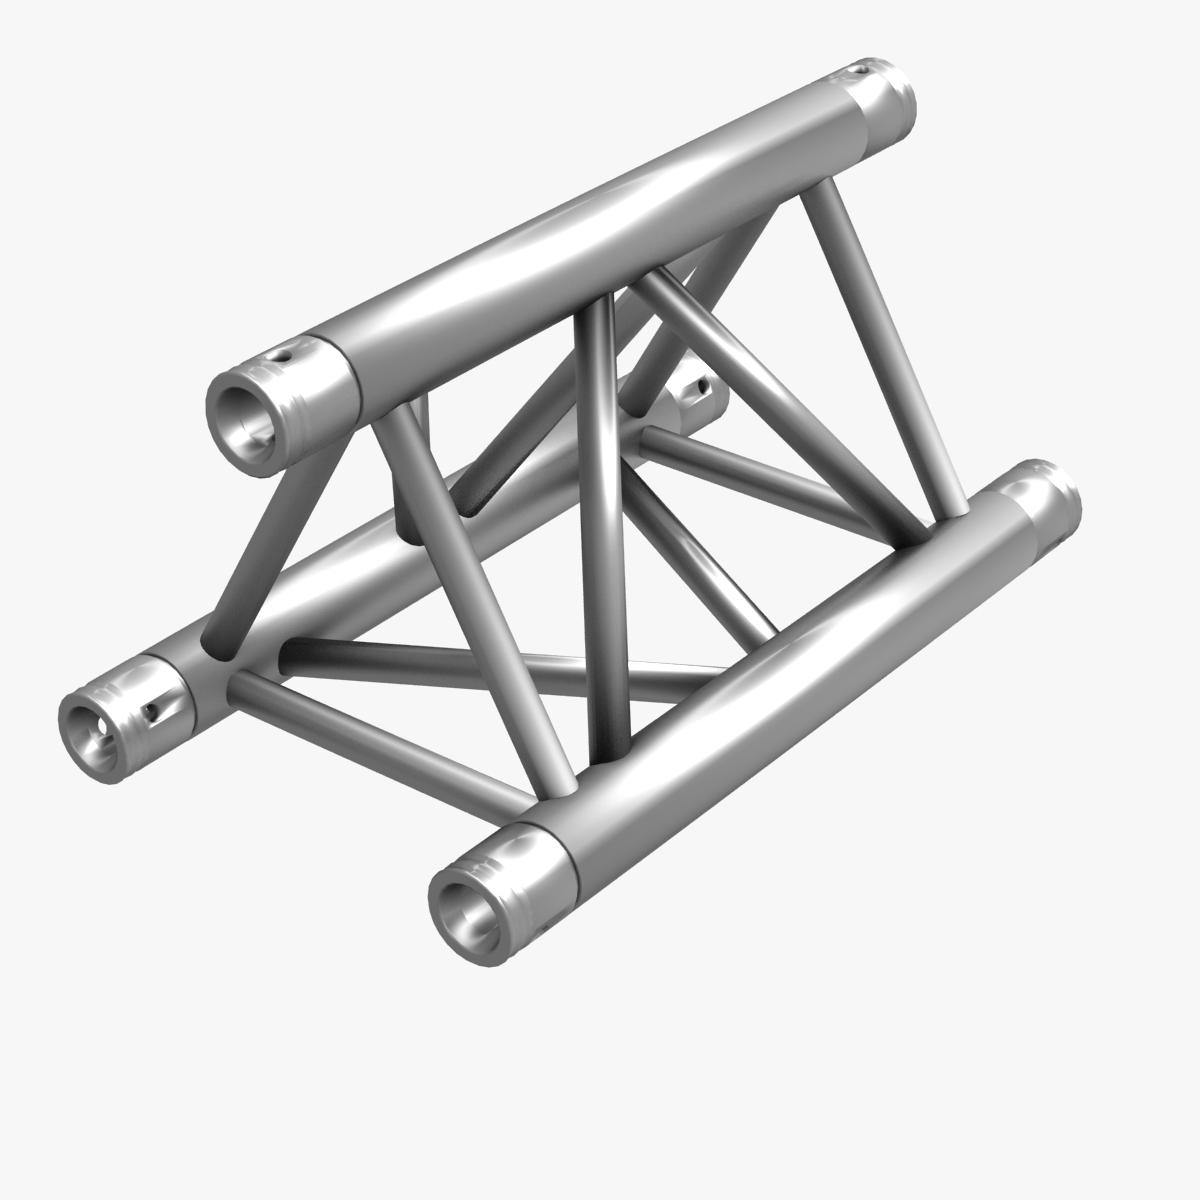 triangular trusses (collection 55 modular pieces) 3d model 3ds max dxf fbx c4d dae texture obj 216214